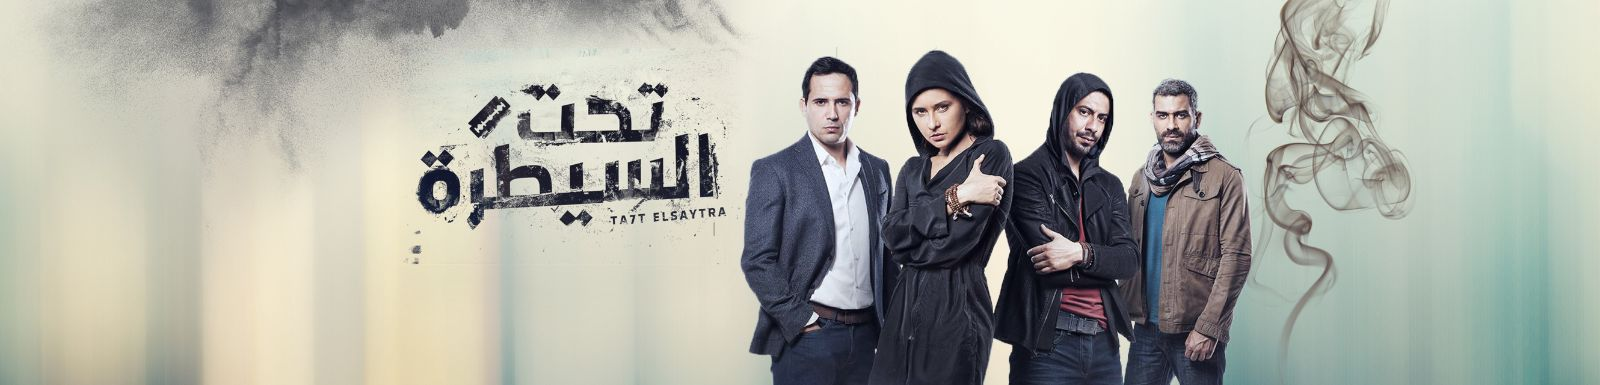 ����� ����� ��� ������� ������ 2 MBC shahid ���� ��